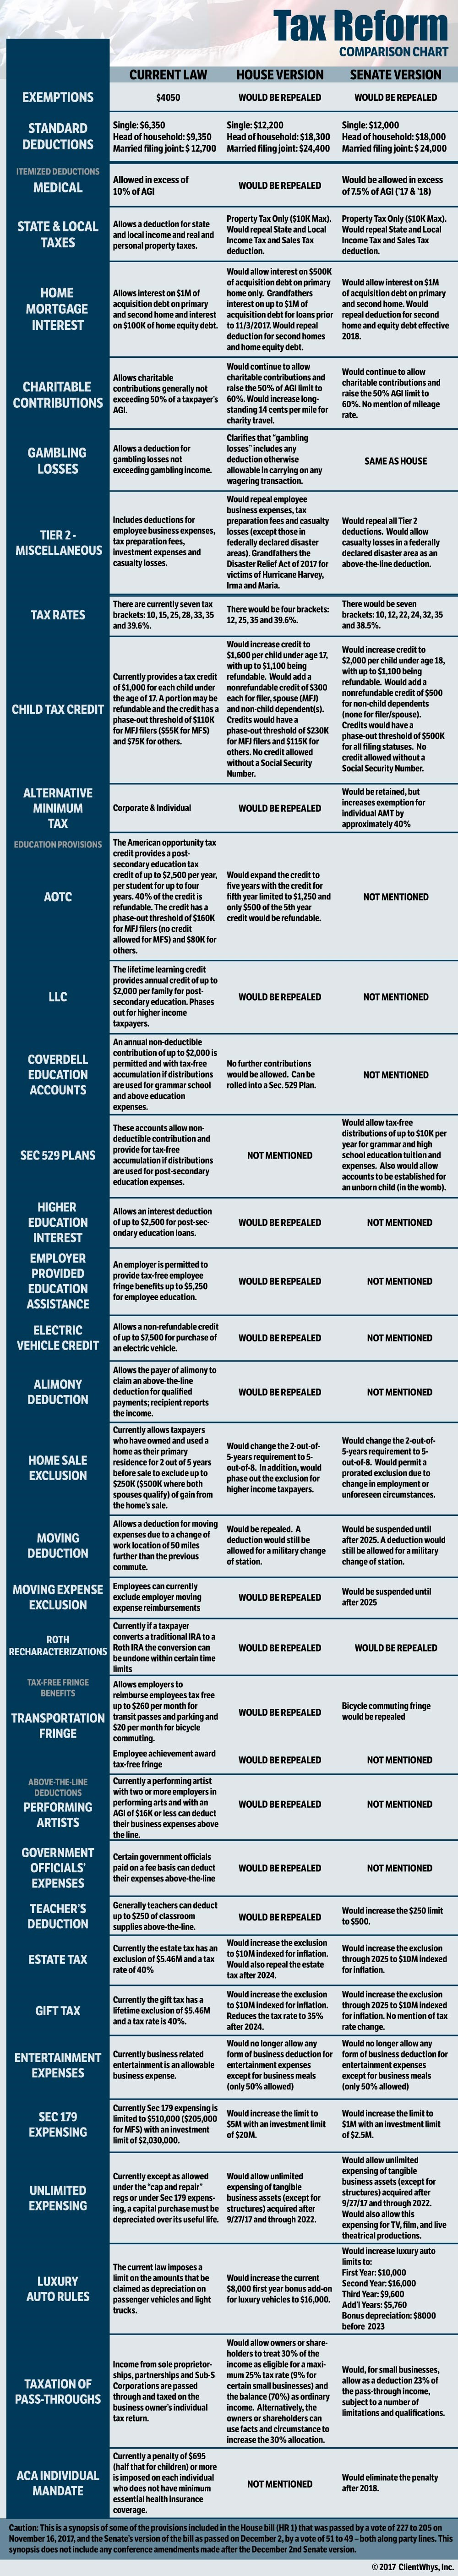 reform_provisions2.jpg